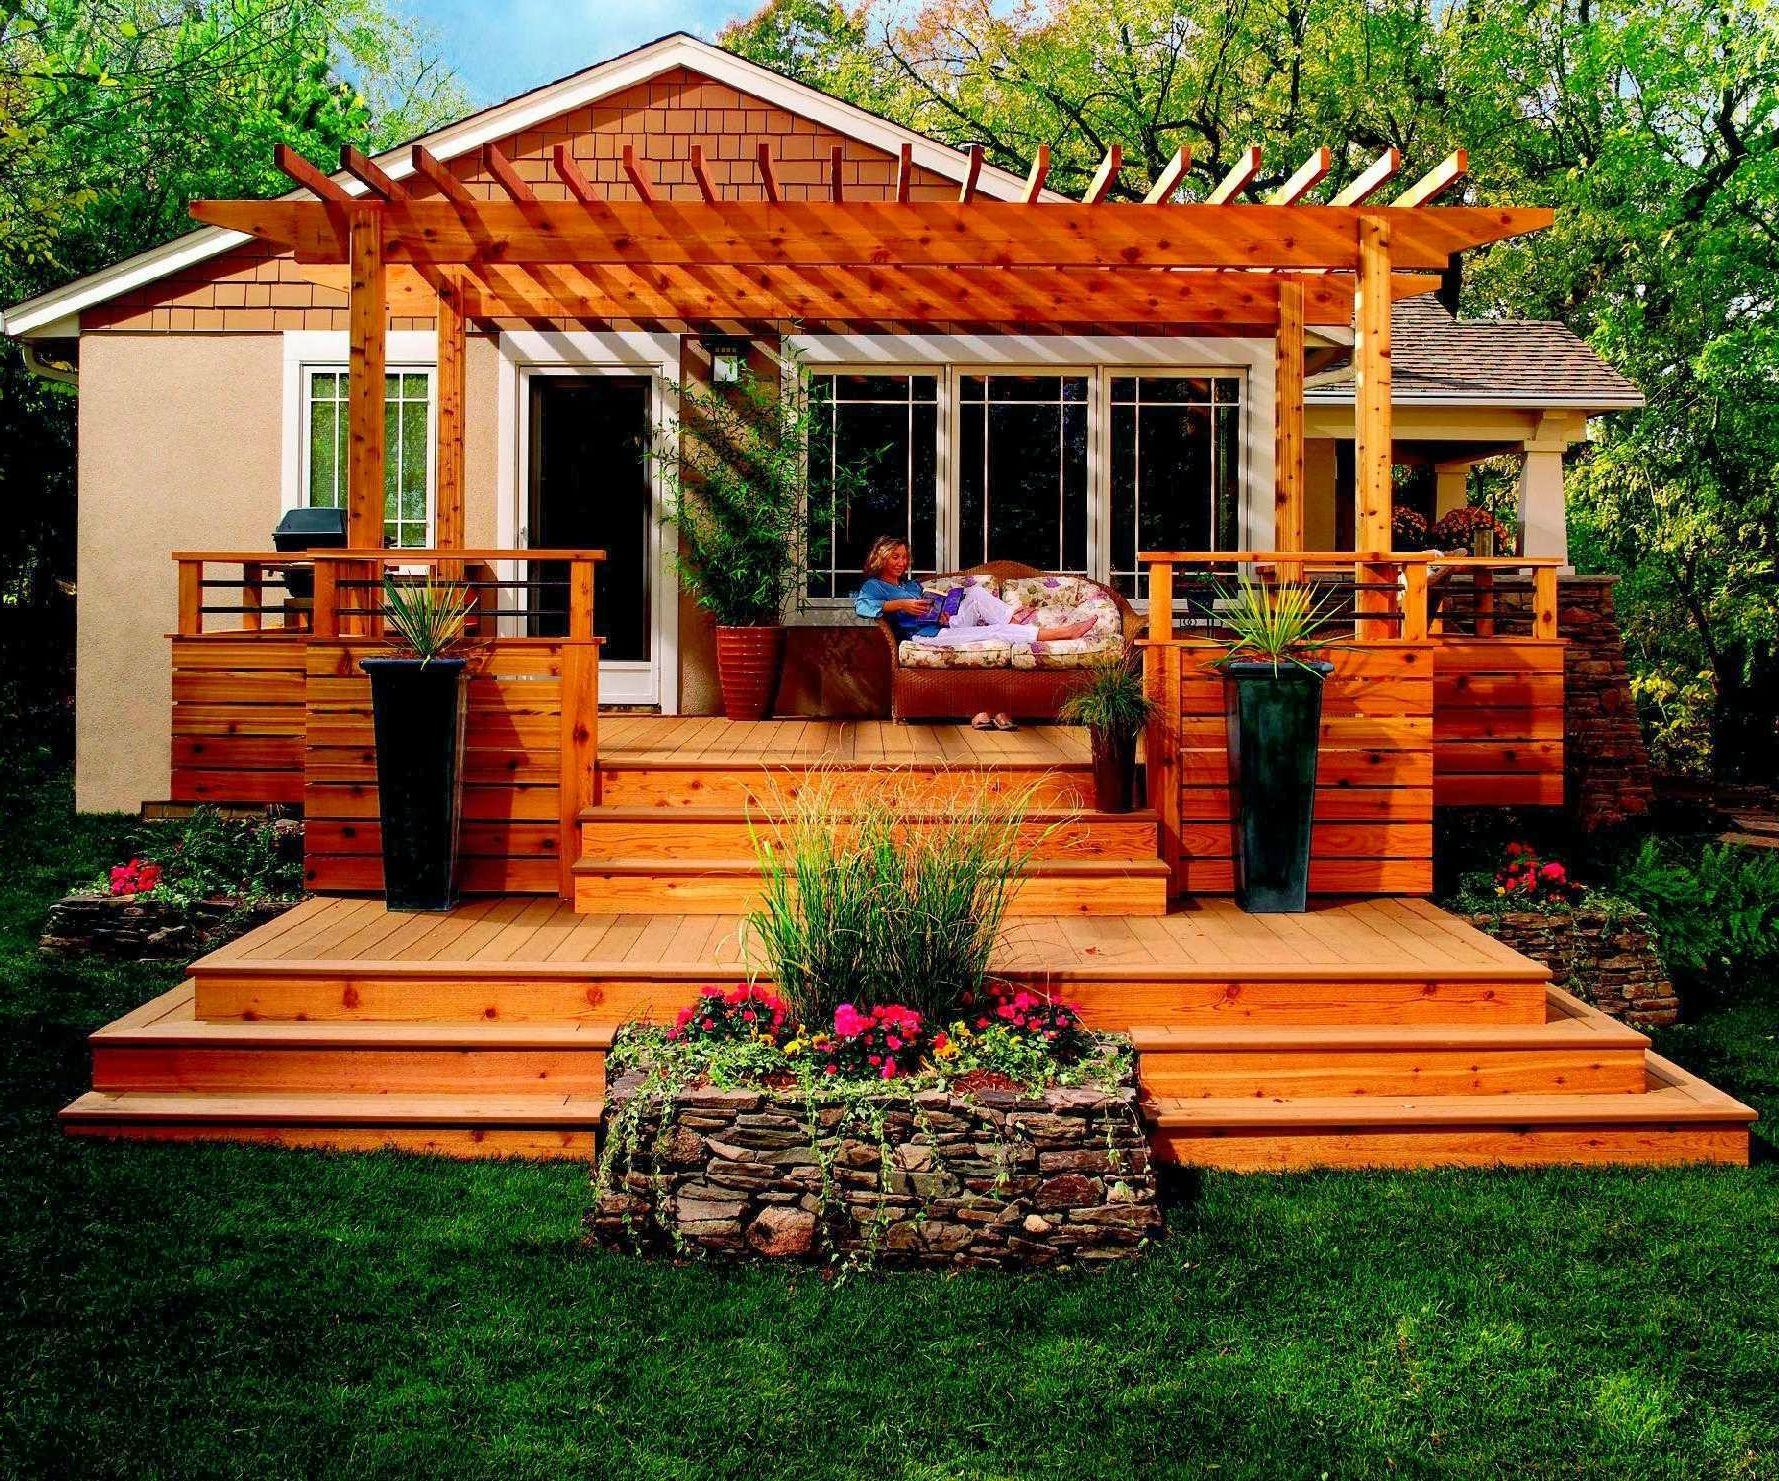 Pretty Backyard with Awesome Small Deck Idea : Pretty ...